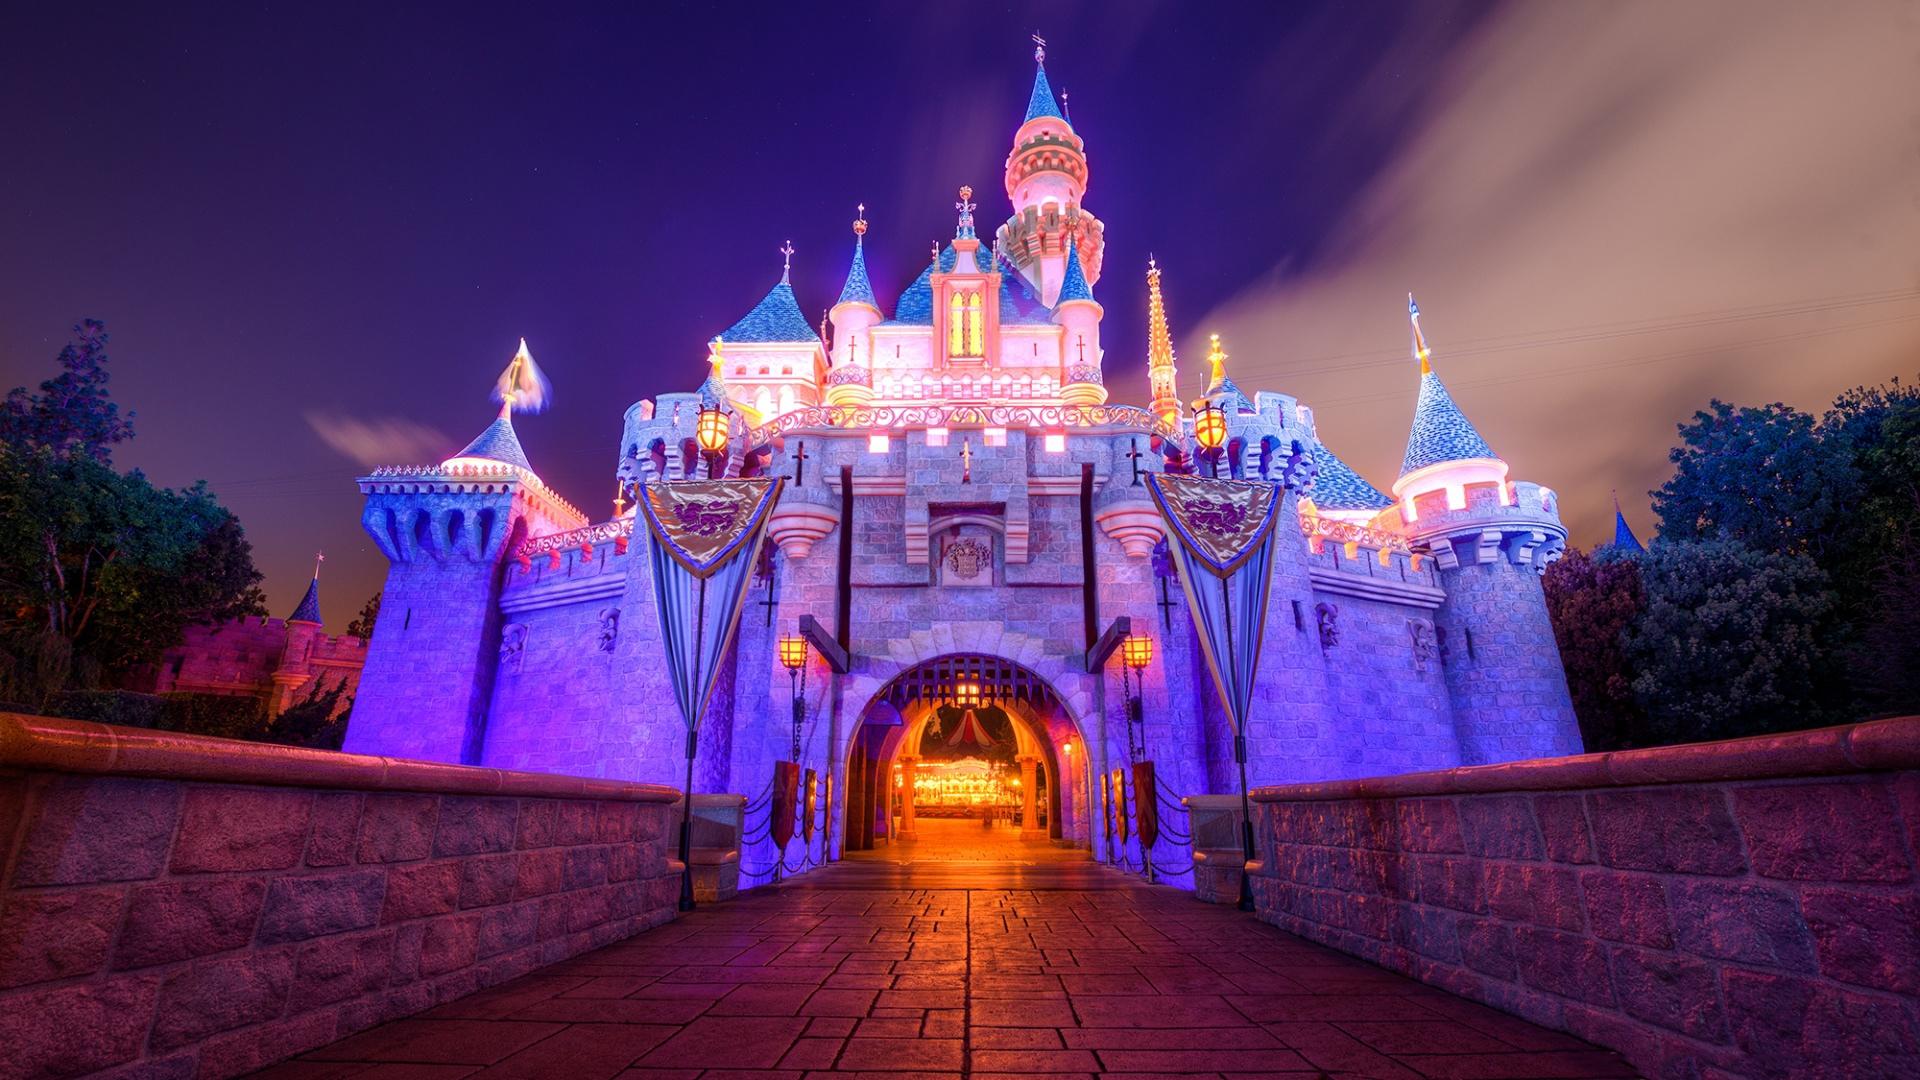 Cute Anime Dogs Wallpaper Disneyland Castle Beautiful In The Night